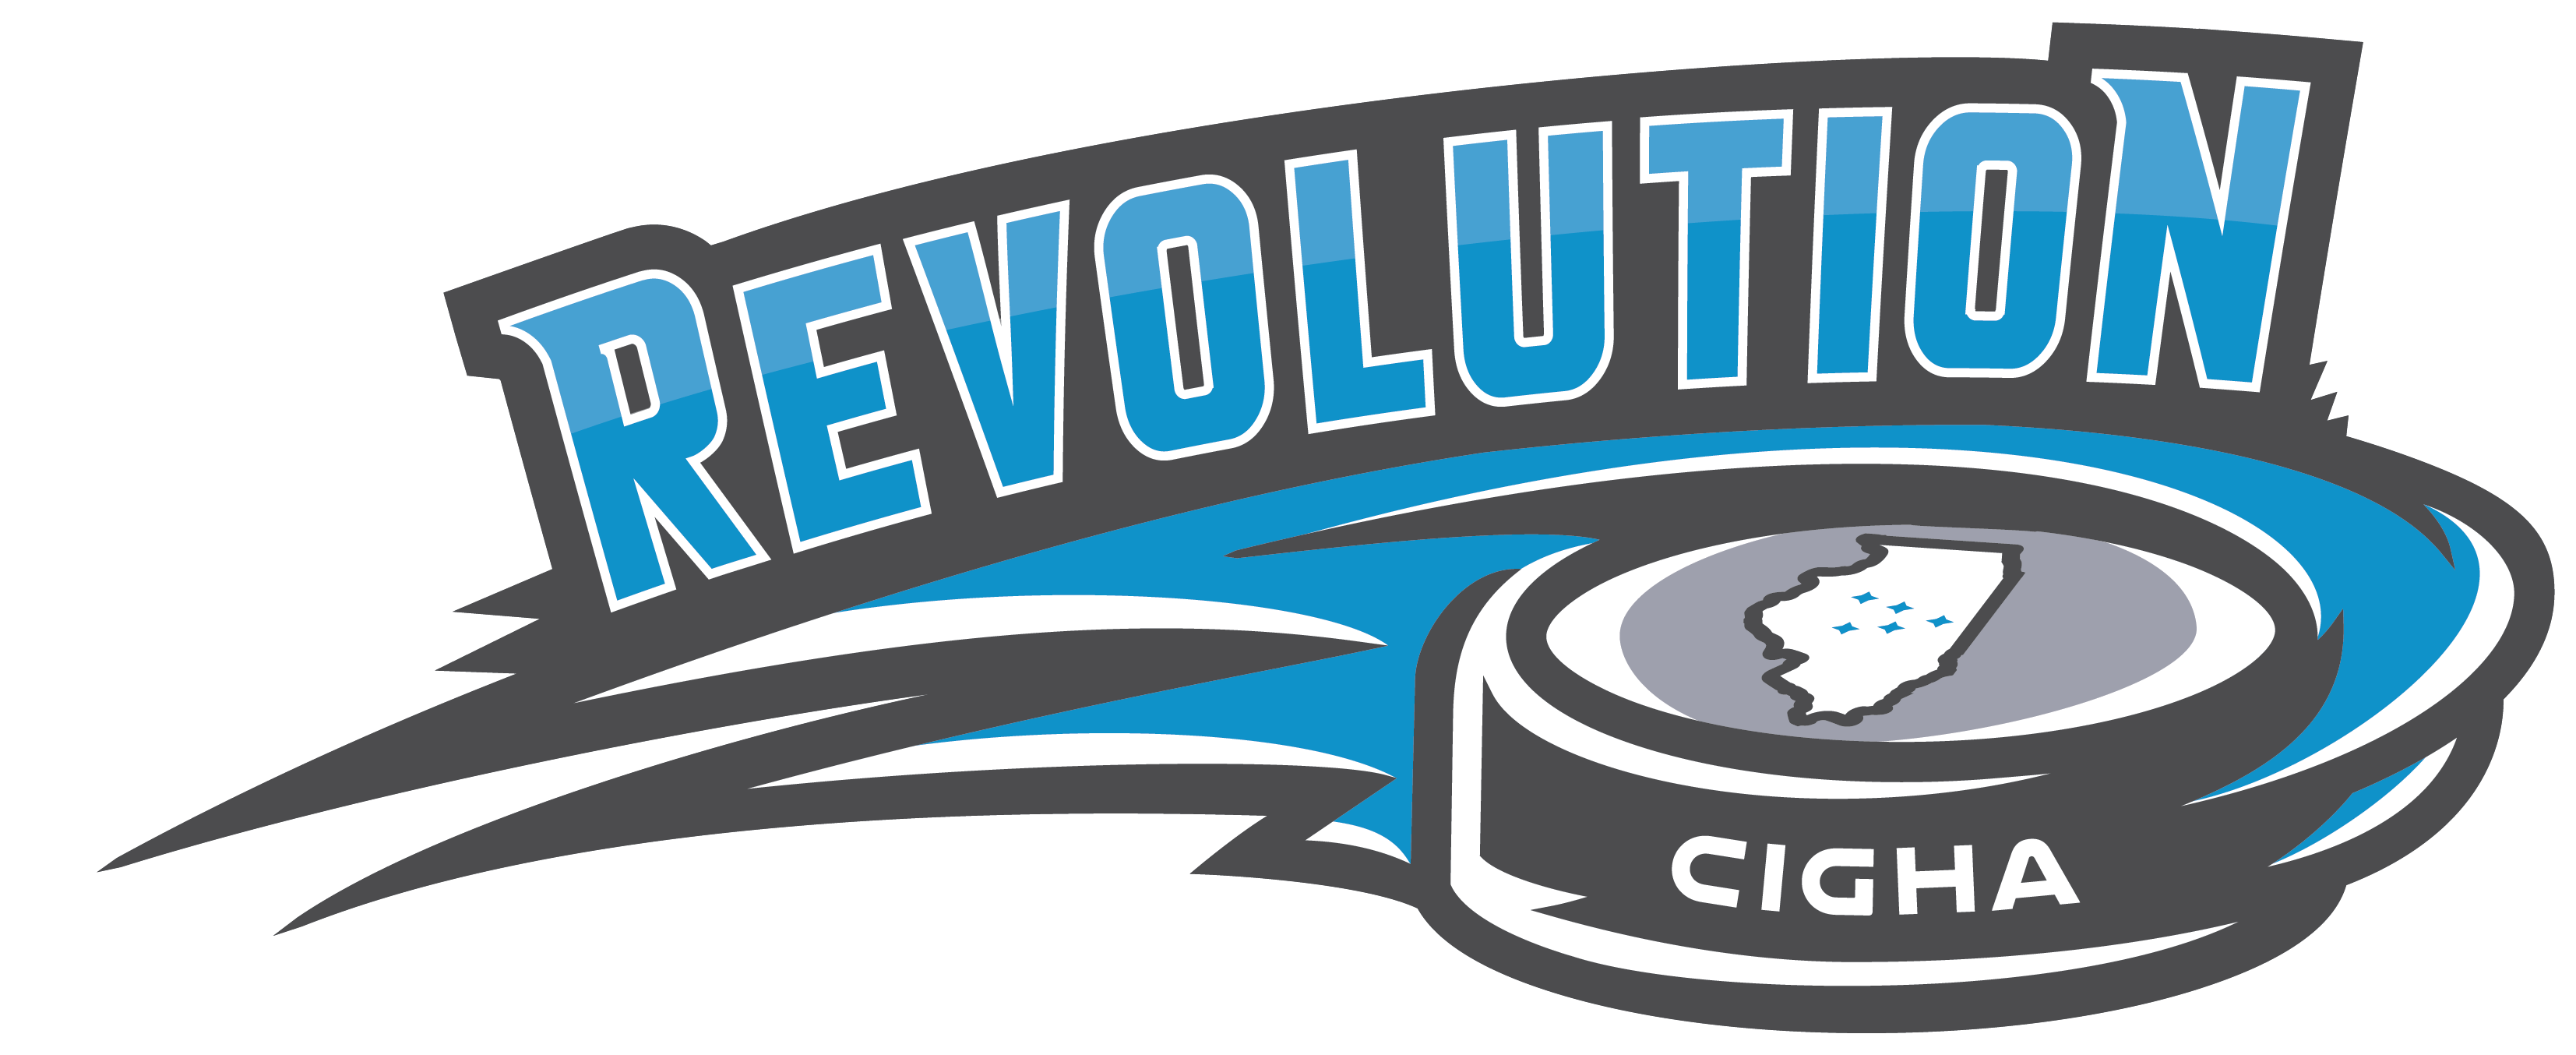 Revolution logo png